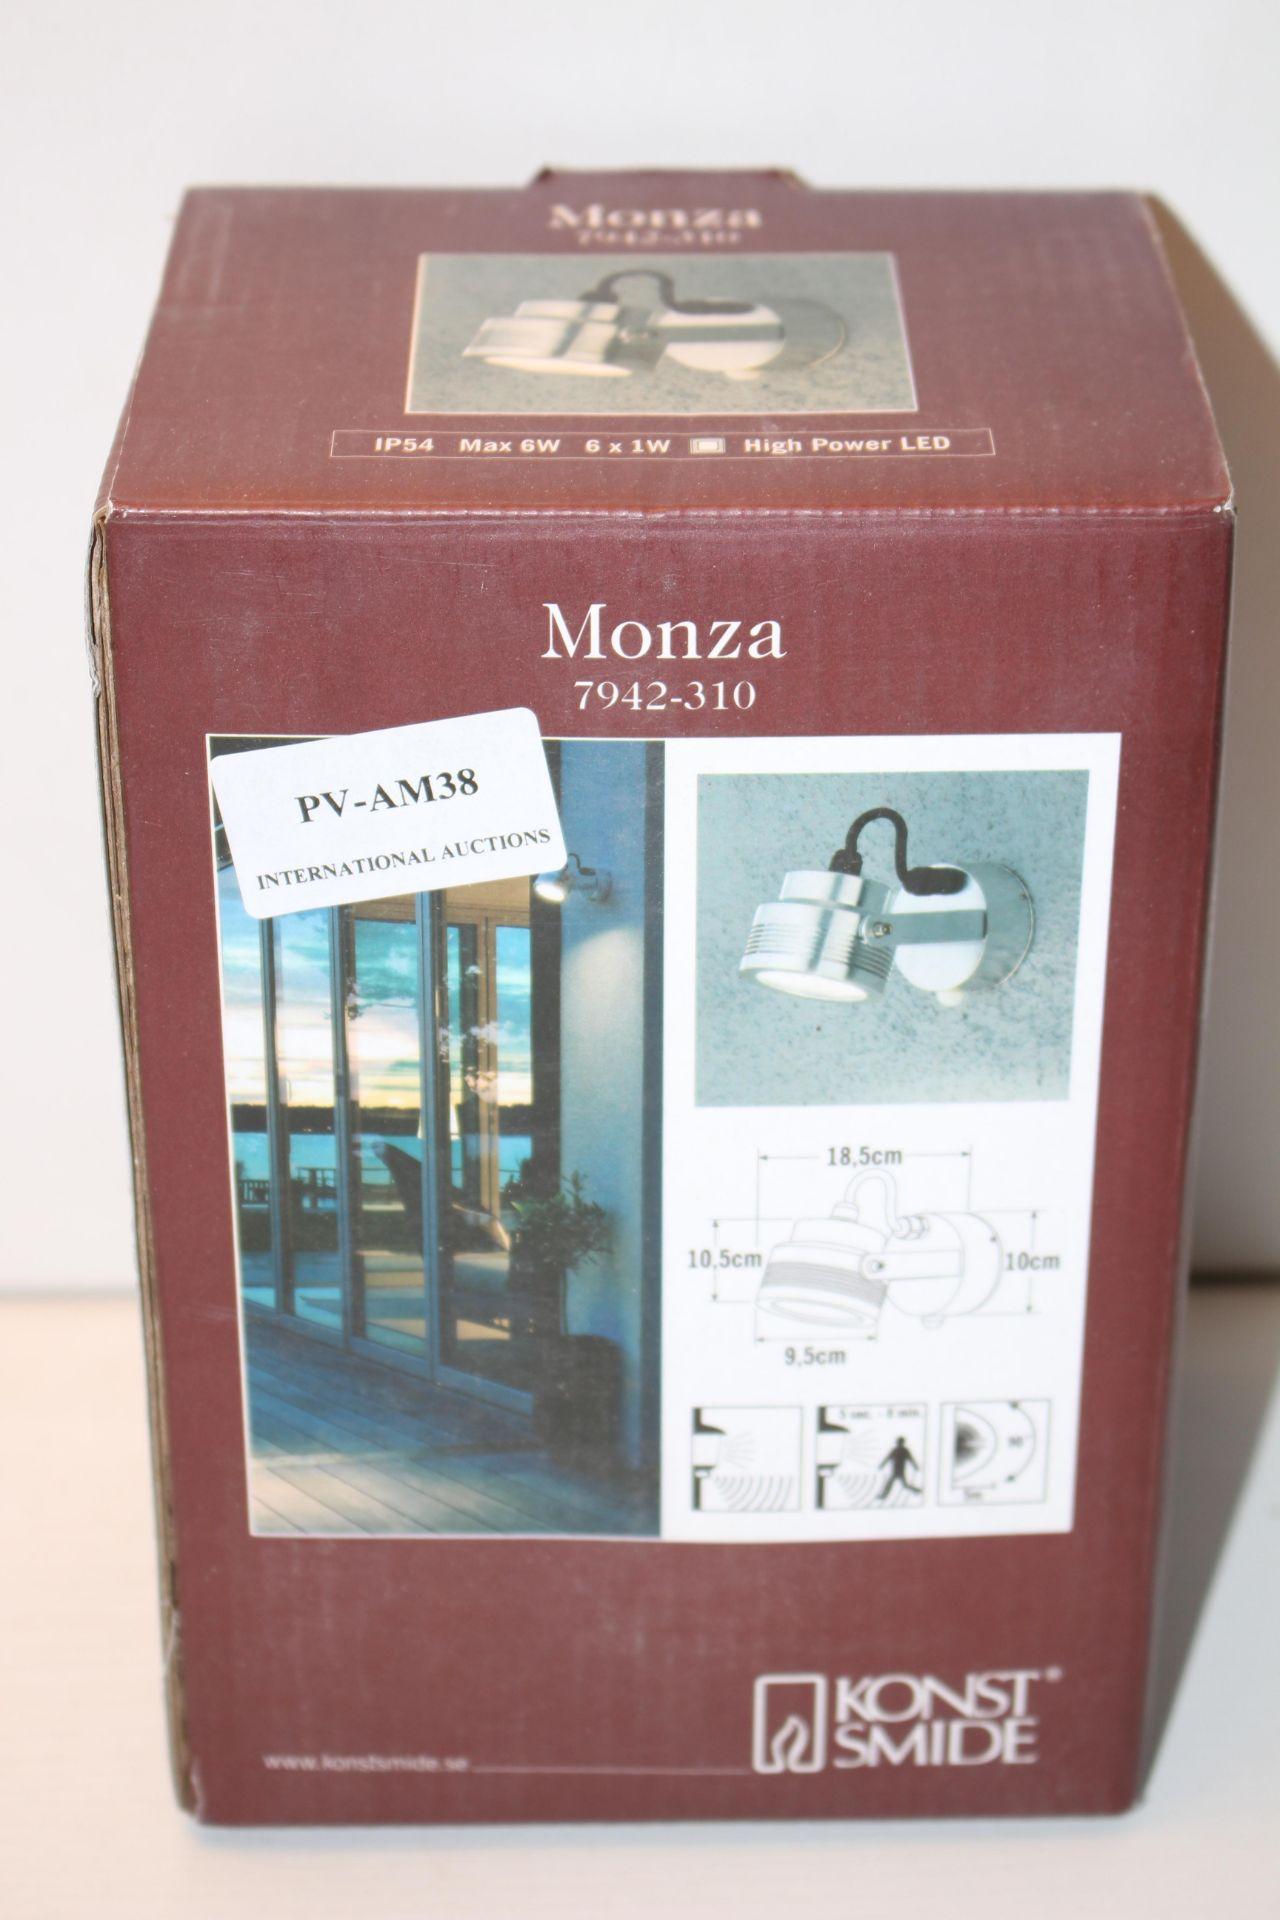 BOXED KONST SMIDE MONZA 7942-310 DESIGNER WALL LIGHT RRP £127.99Condition ReportAppraisal